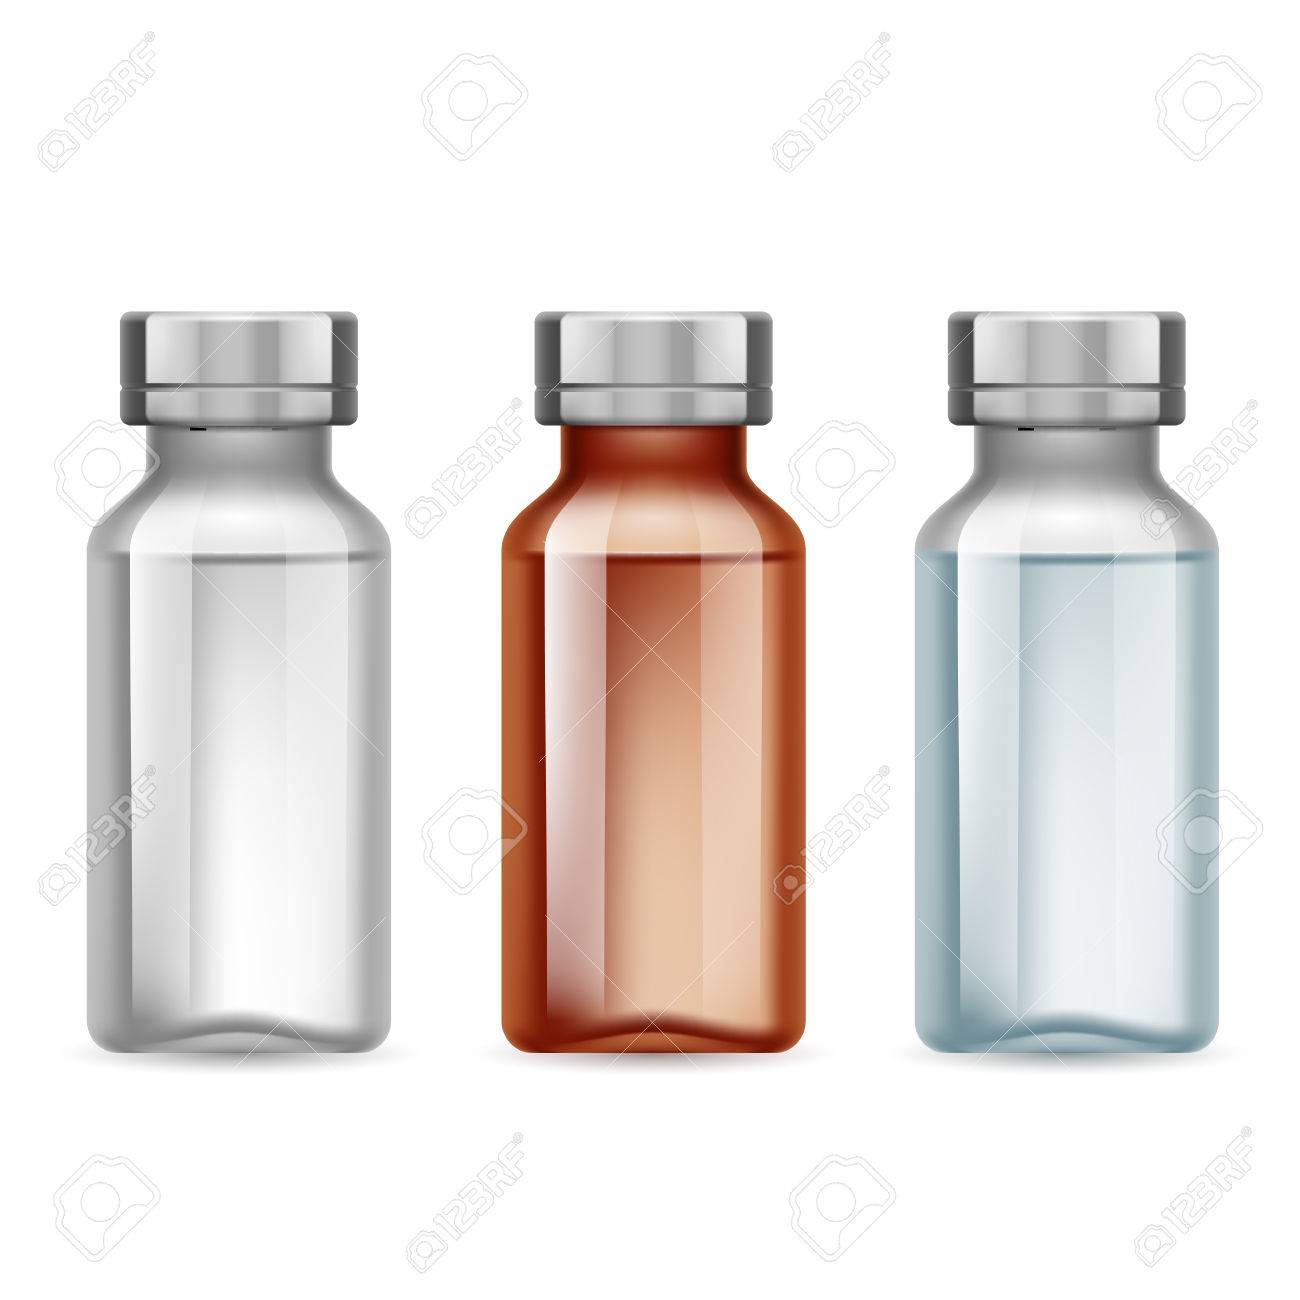 Set of small medical bottle dark and light Stock Vector - 45738201